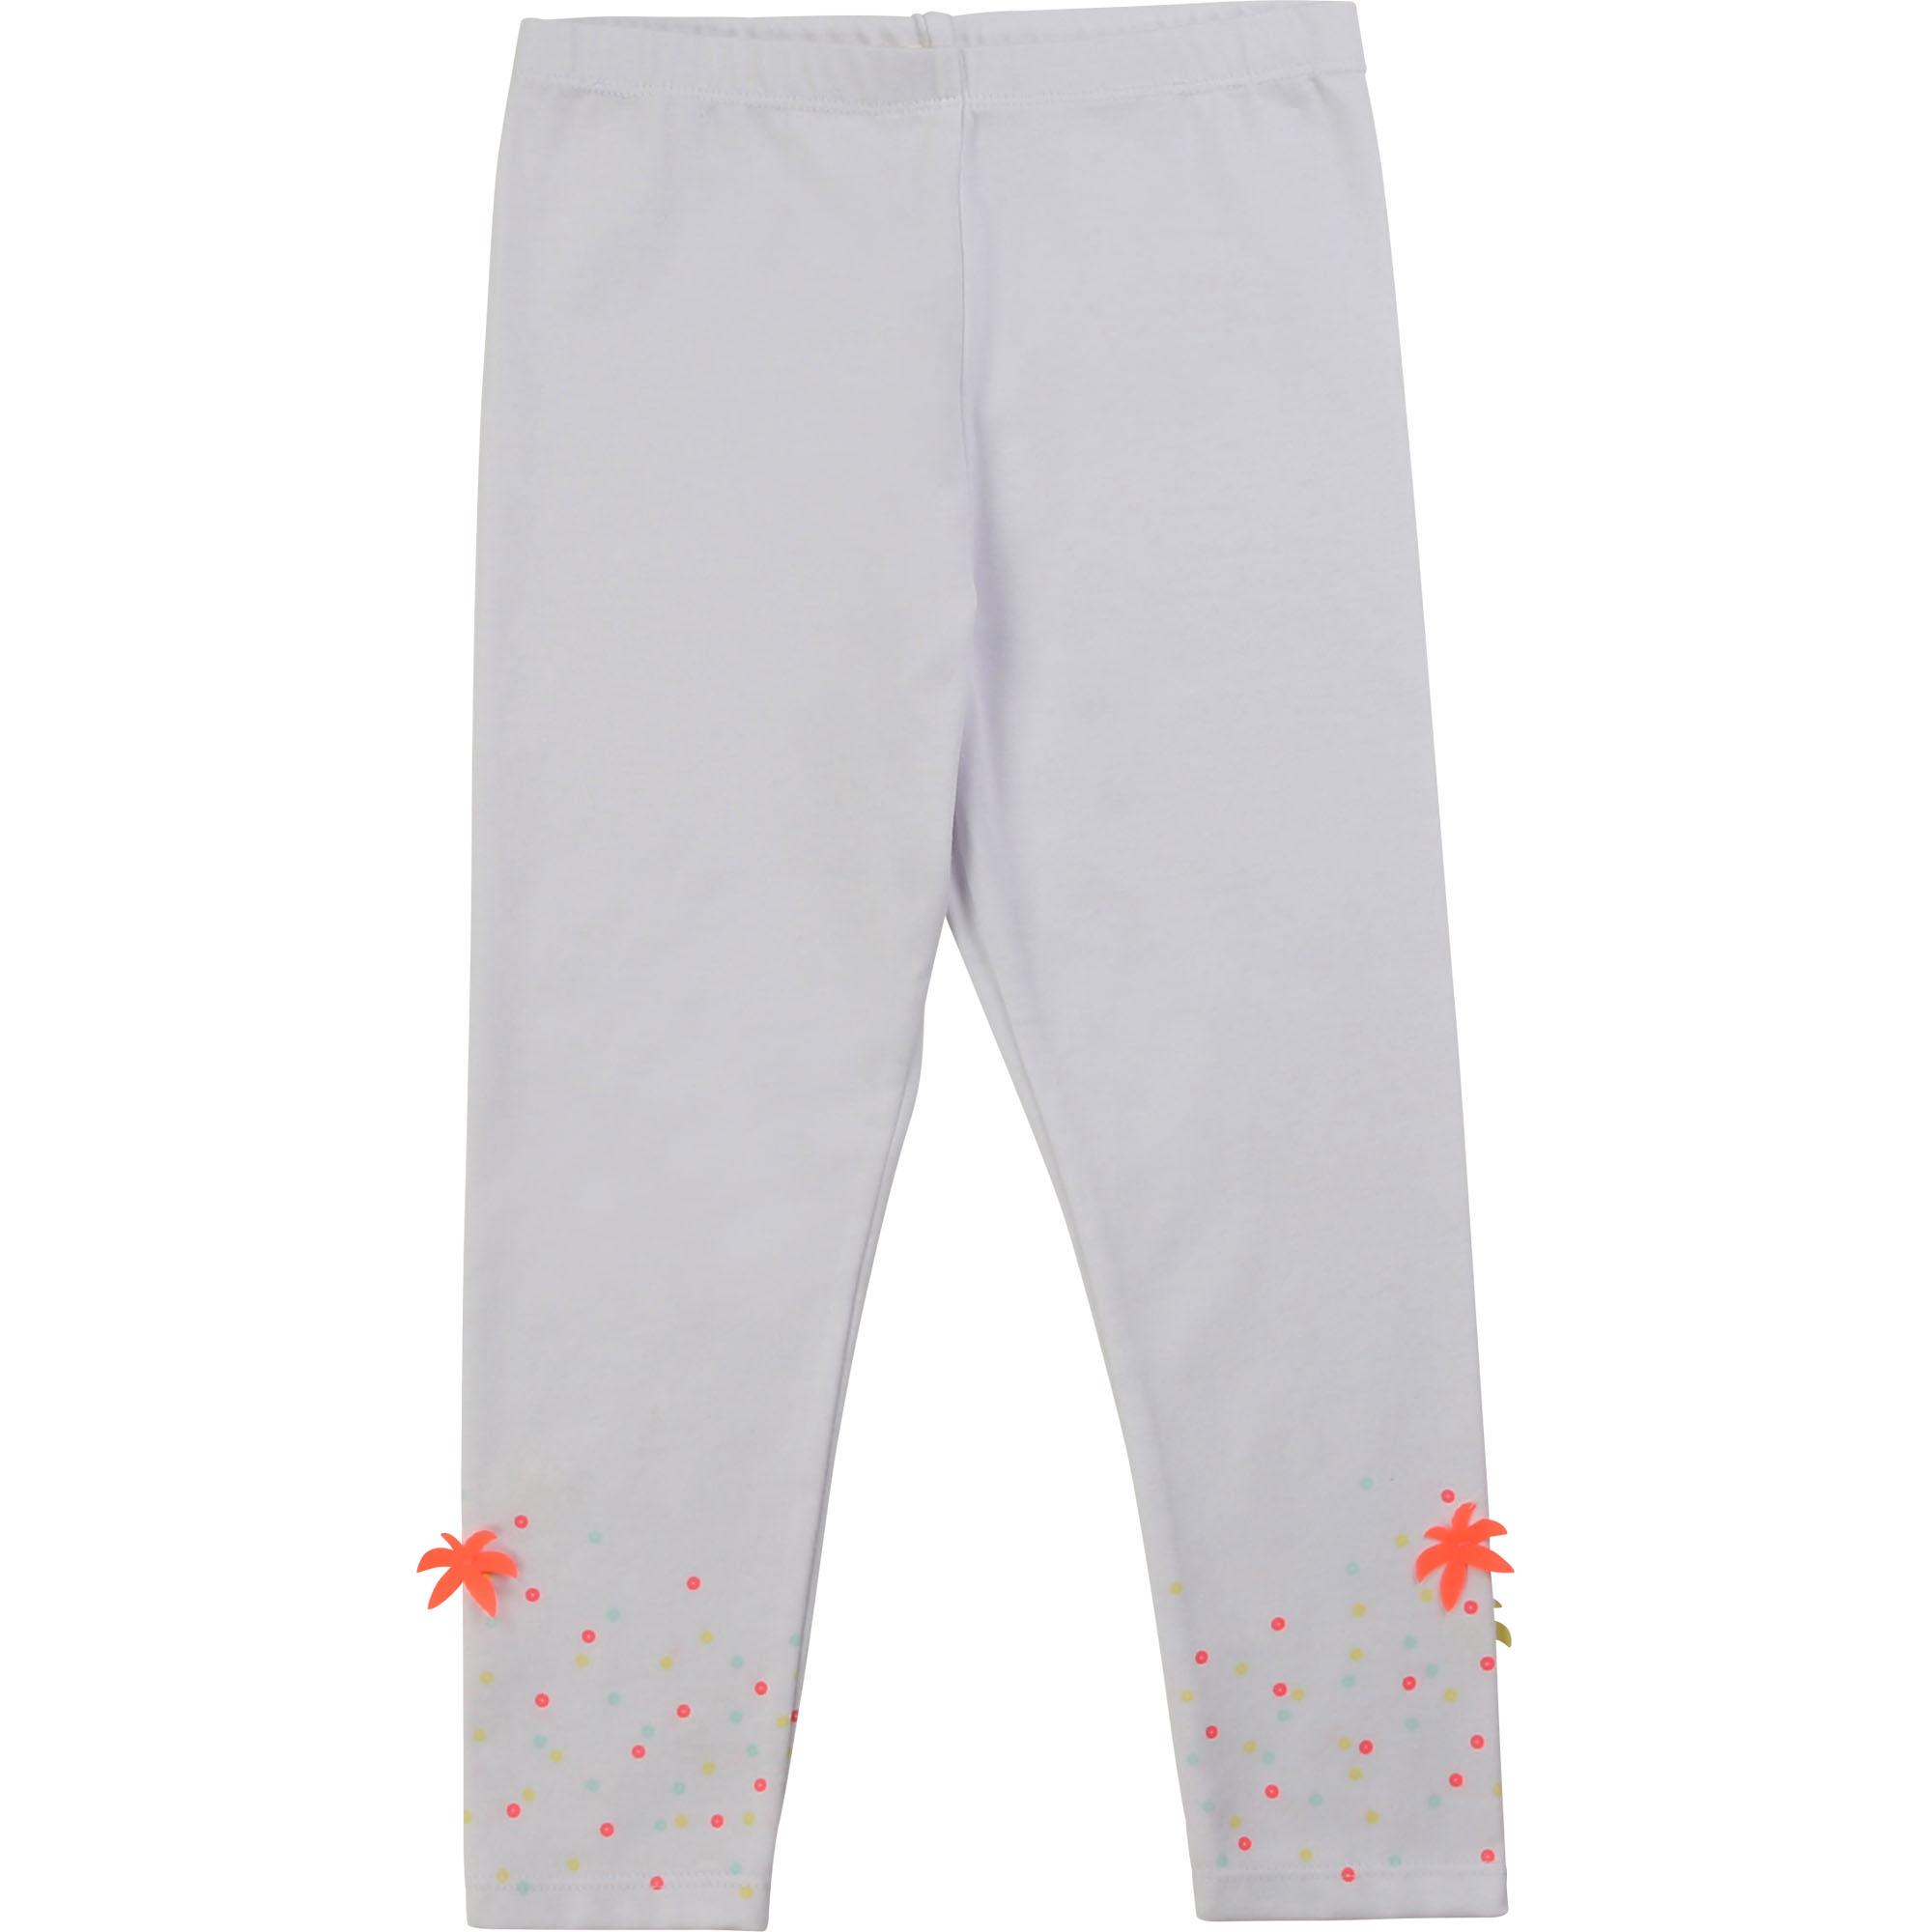 Billieblush valkoiset legginsit ALE -20% (OVH 19€)